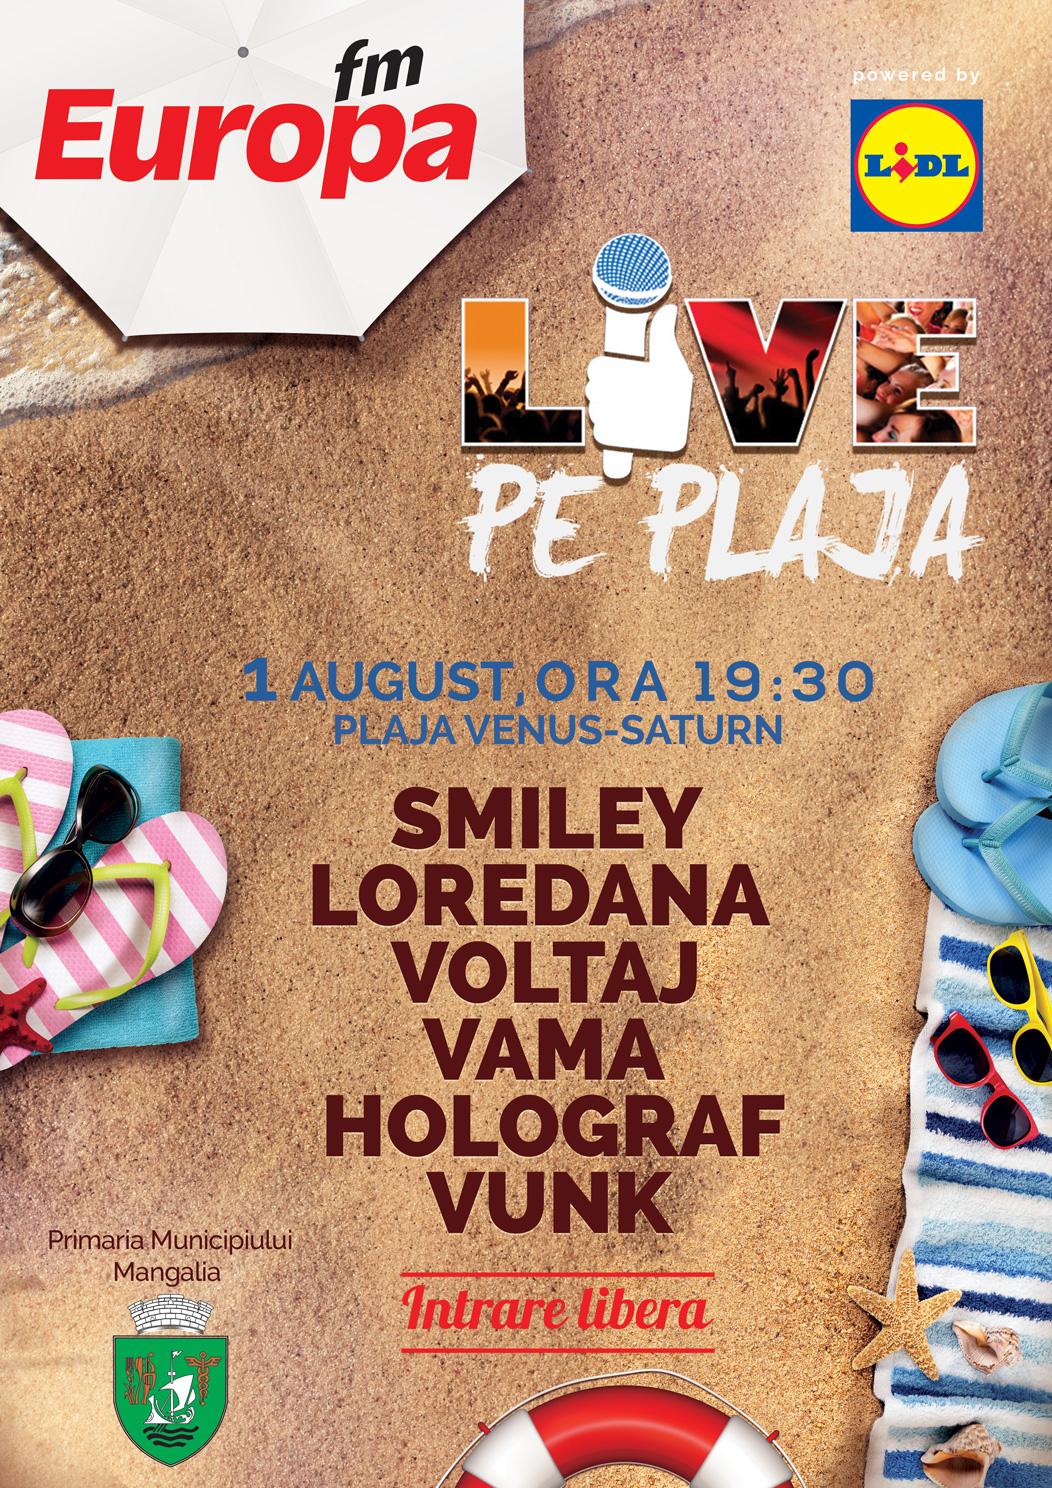 Europa-FM-Live-pe-plaja-2015_afisul-oficial